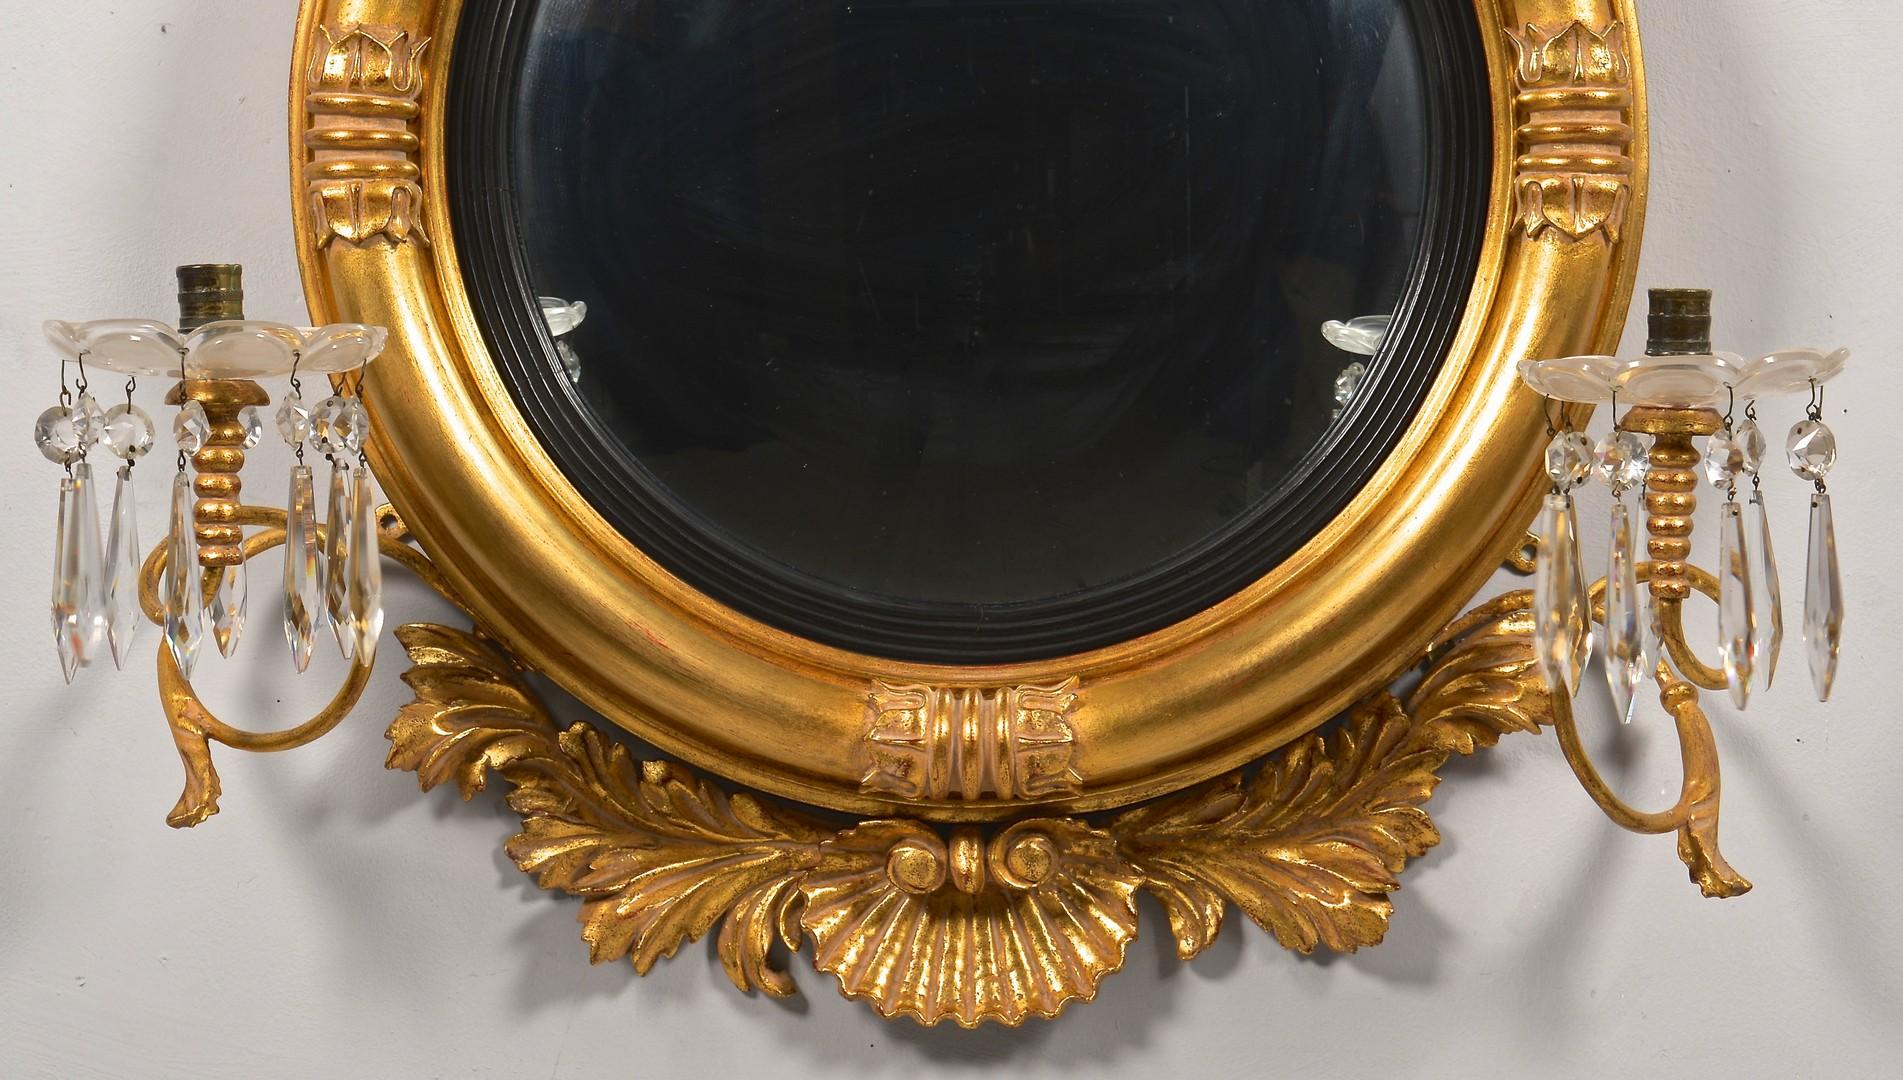 Lot 319: 2 Decorative Gilt Mirrors, incl. Bullseye